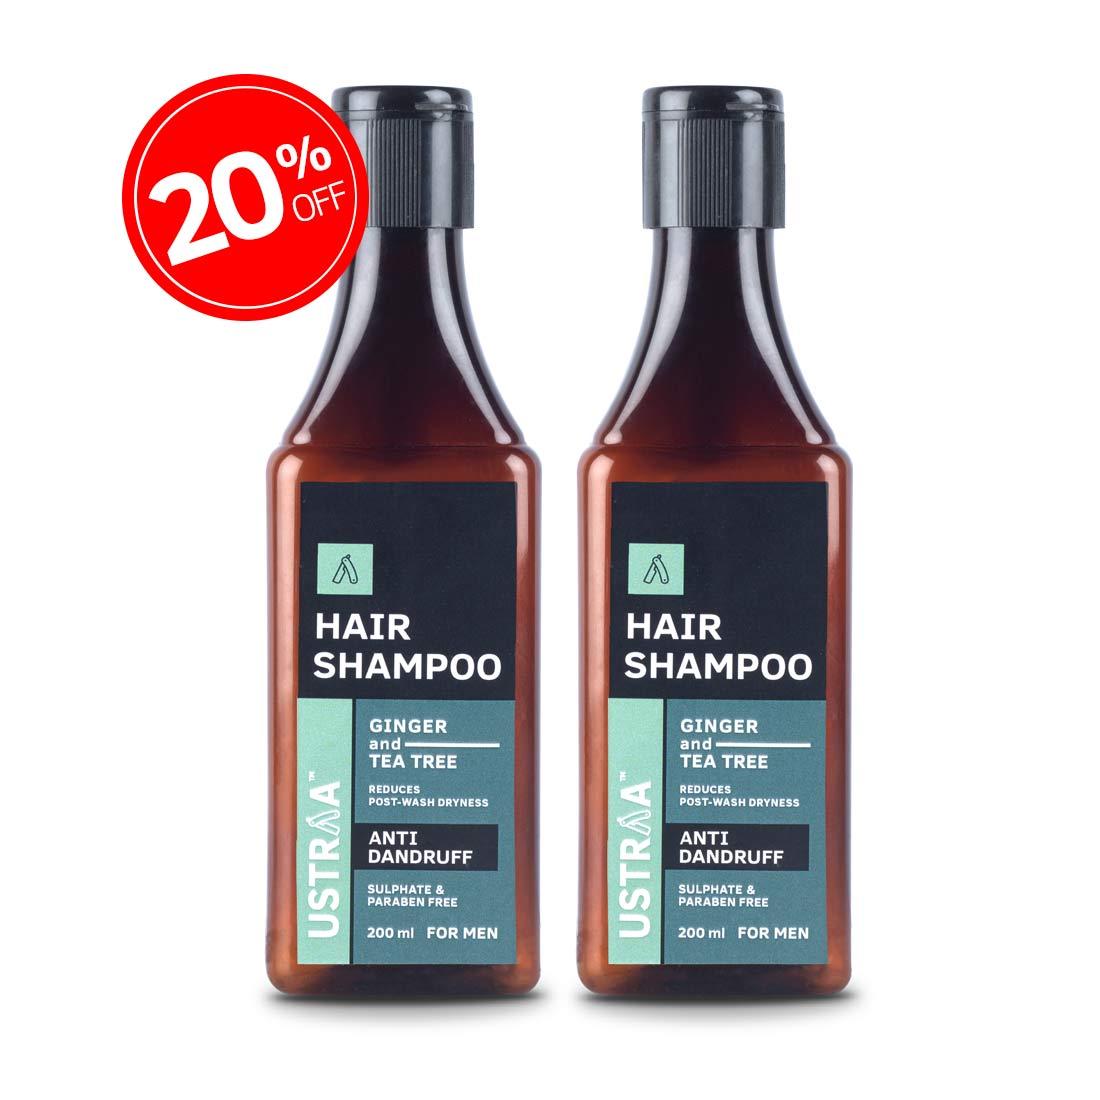 Anti Dandruff Hair Shampoo - 200 ml- Set of 2